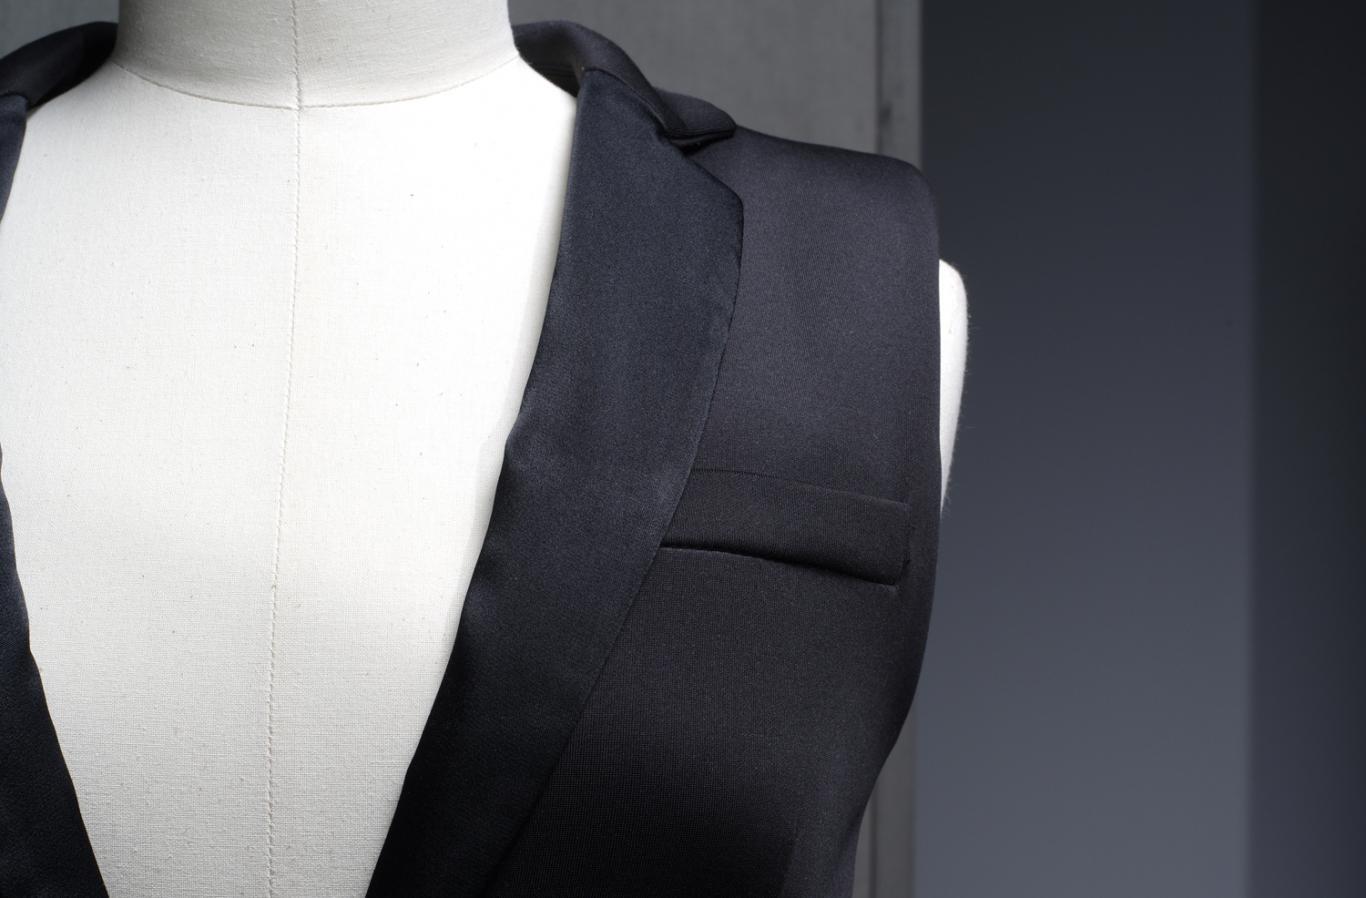 Detalle de un maniquí blanco vestido con un chaleco con solapa negra